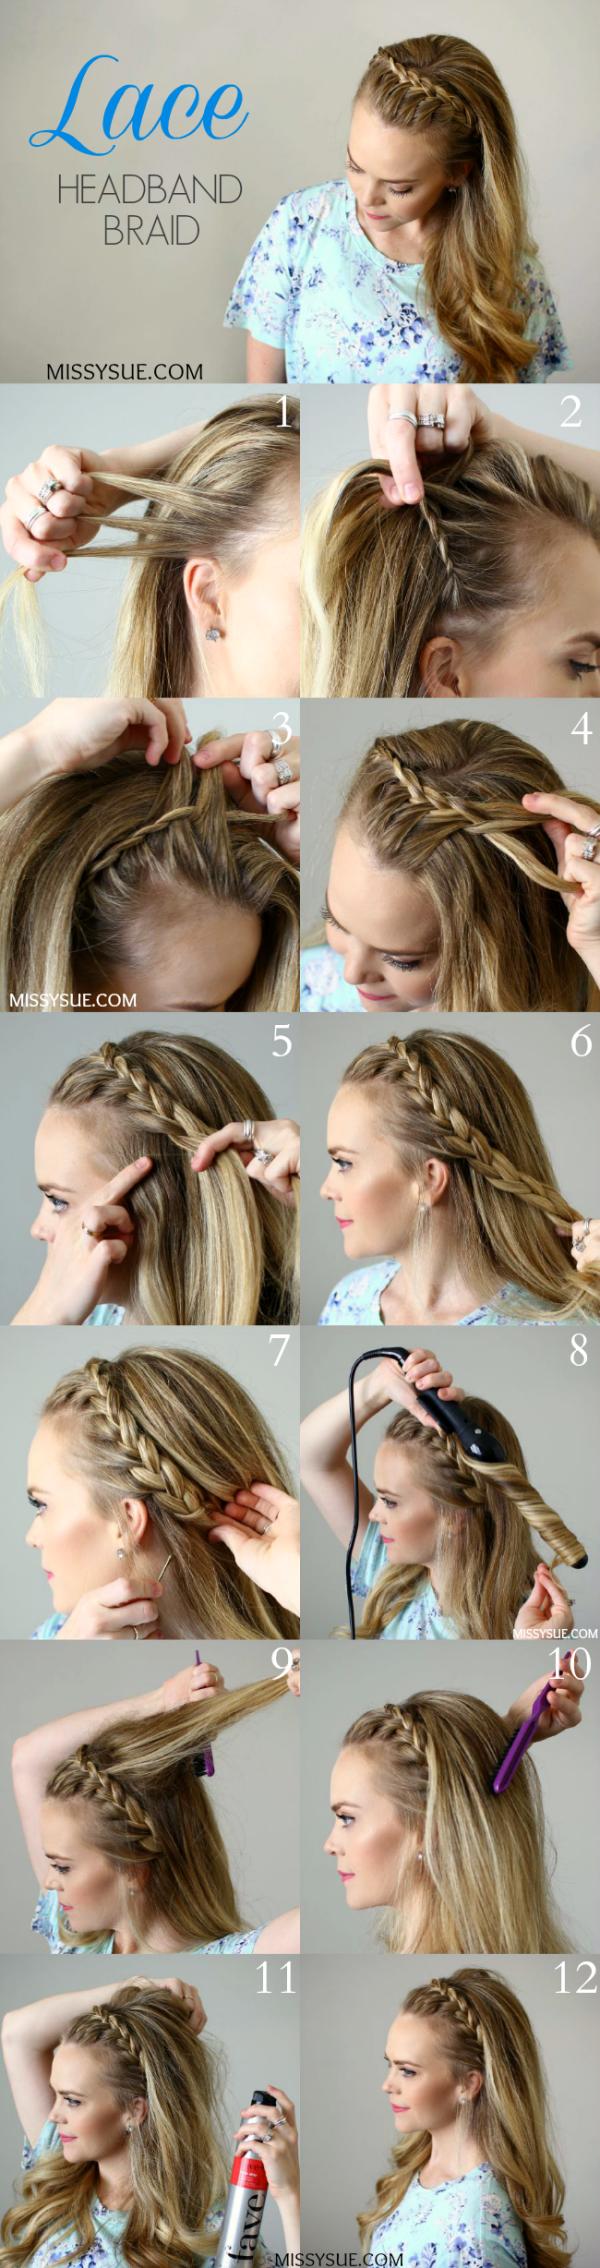 Lace Headband Braid | Braided hairstyles tutorials, Long hair styles, Hair hacks